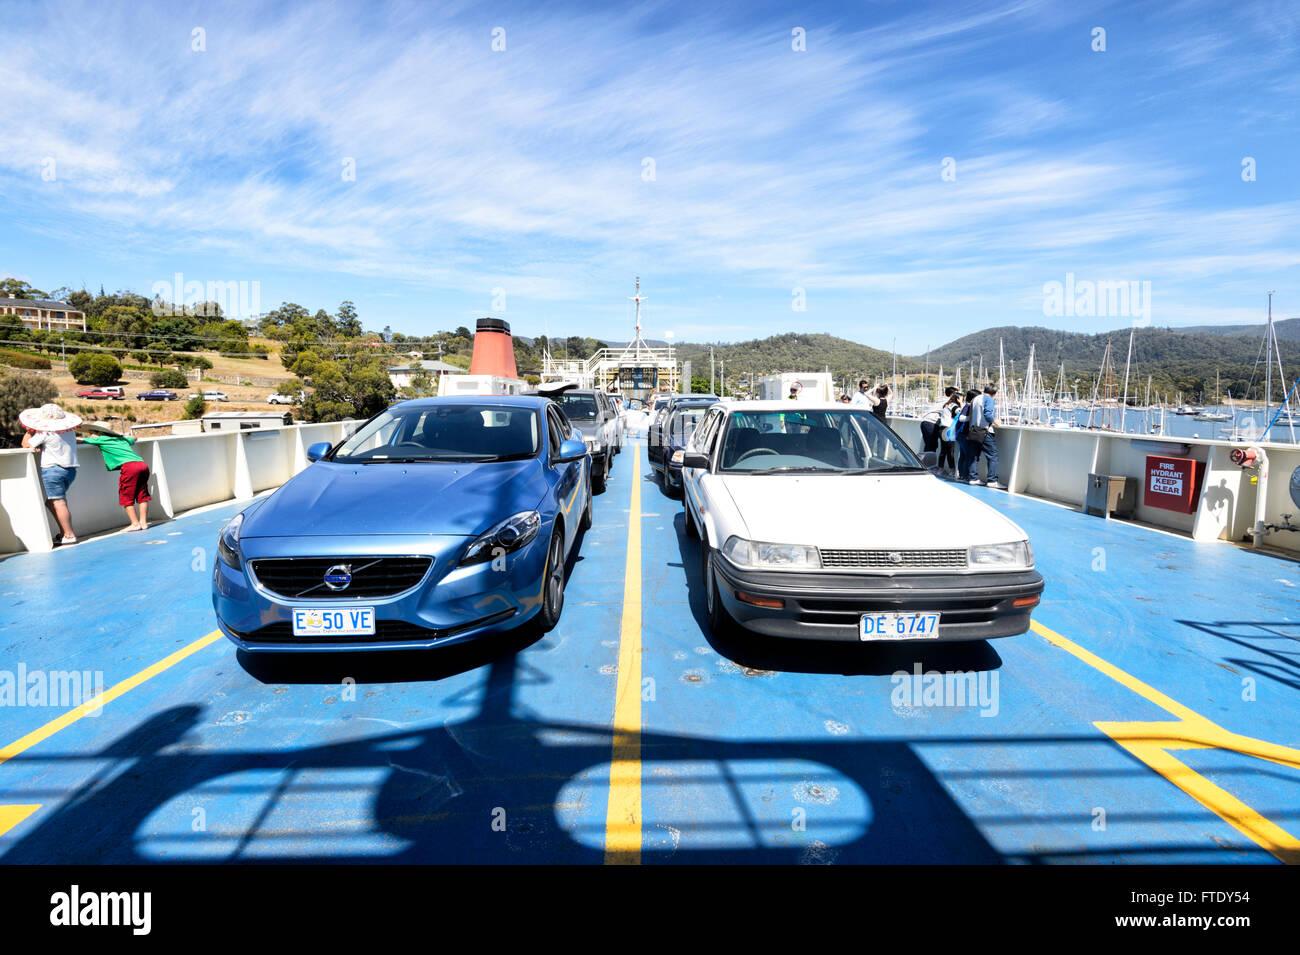 Car Ferry from Kettering to Bruny Island, Tasmania, Australia - Stock Image